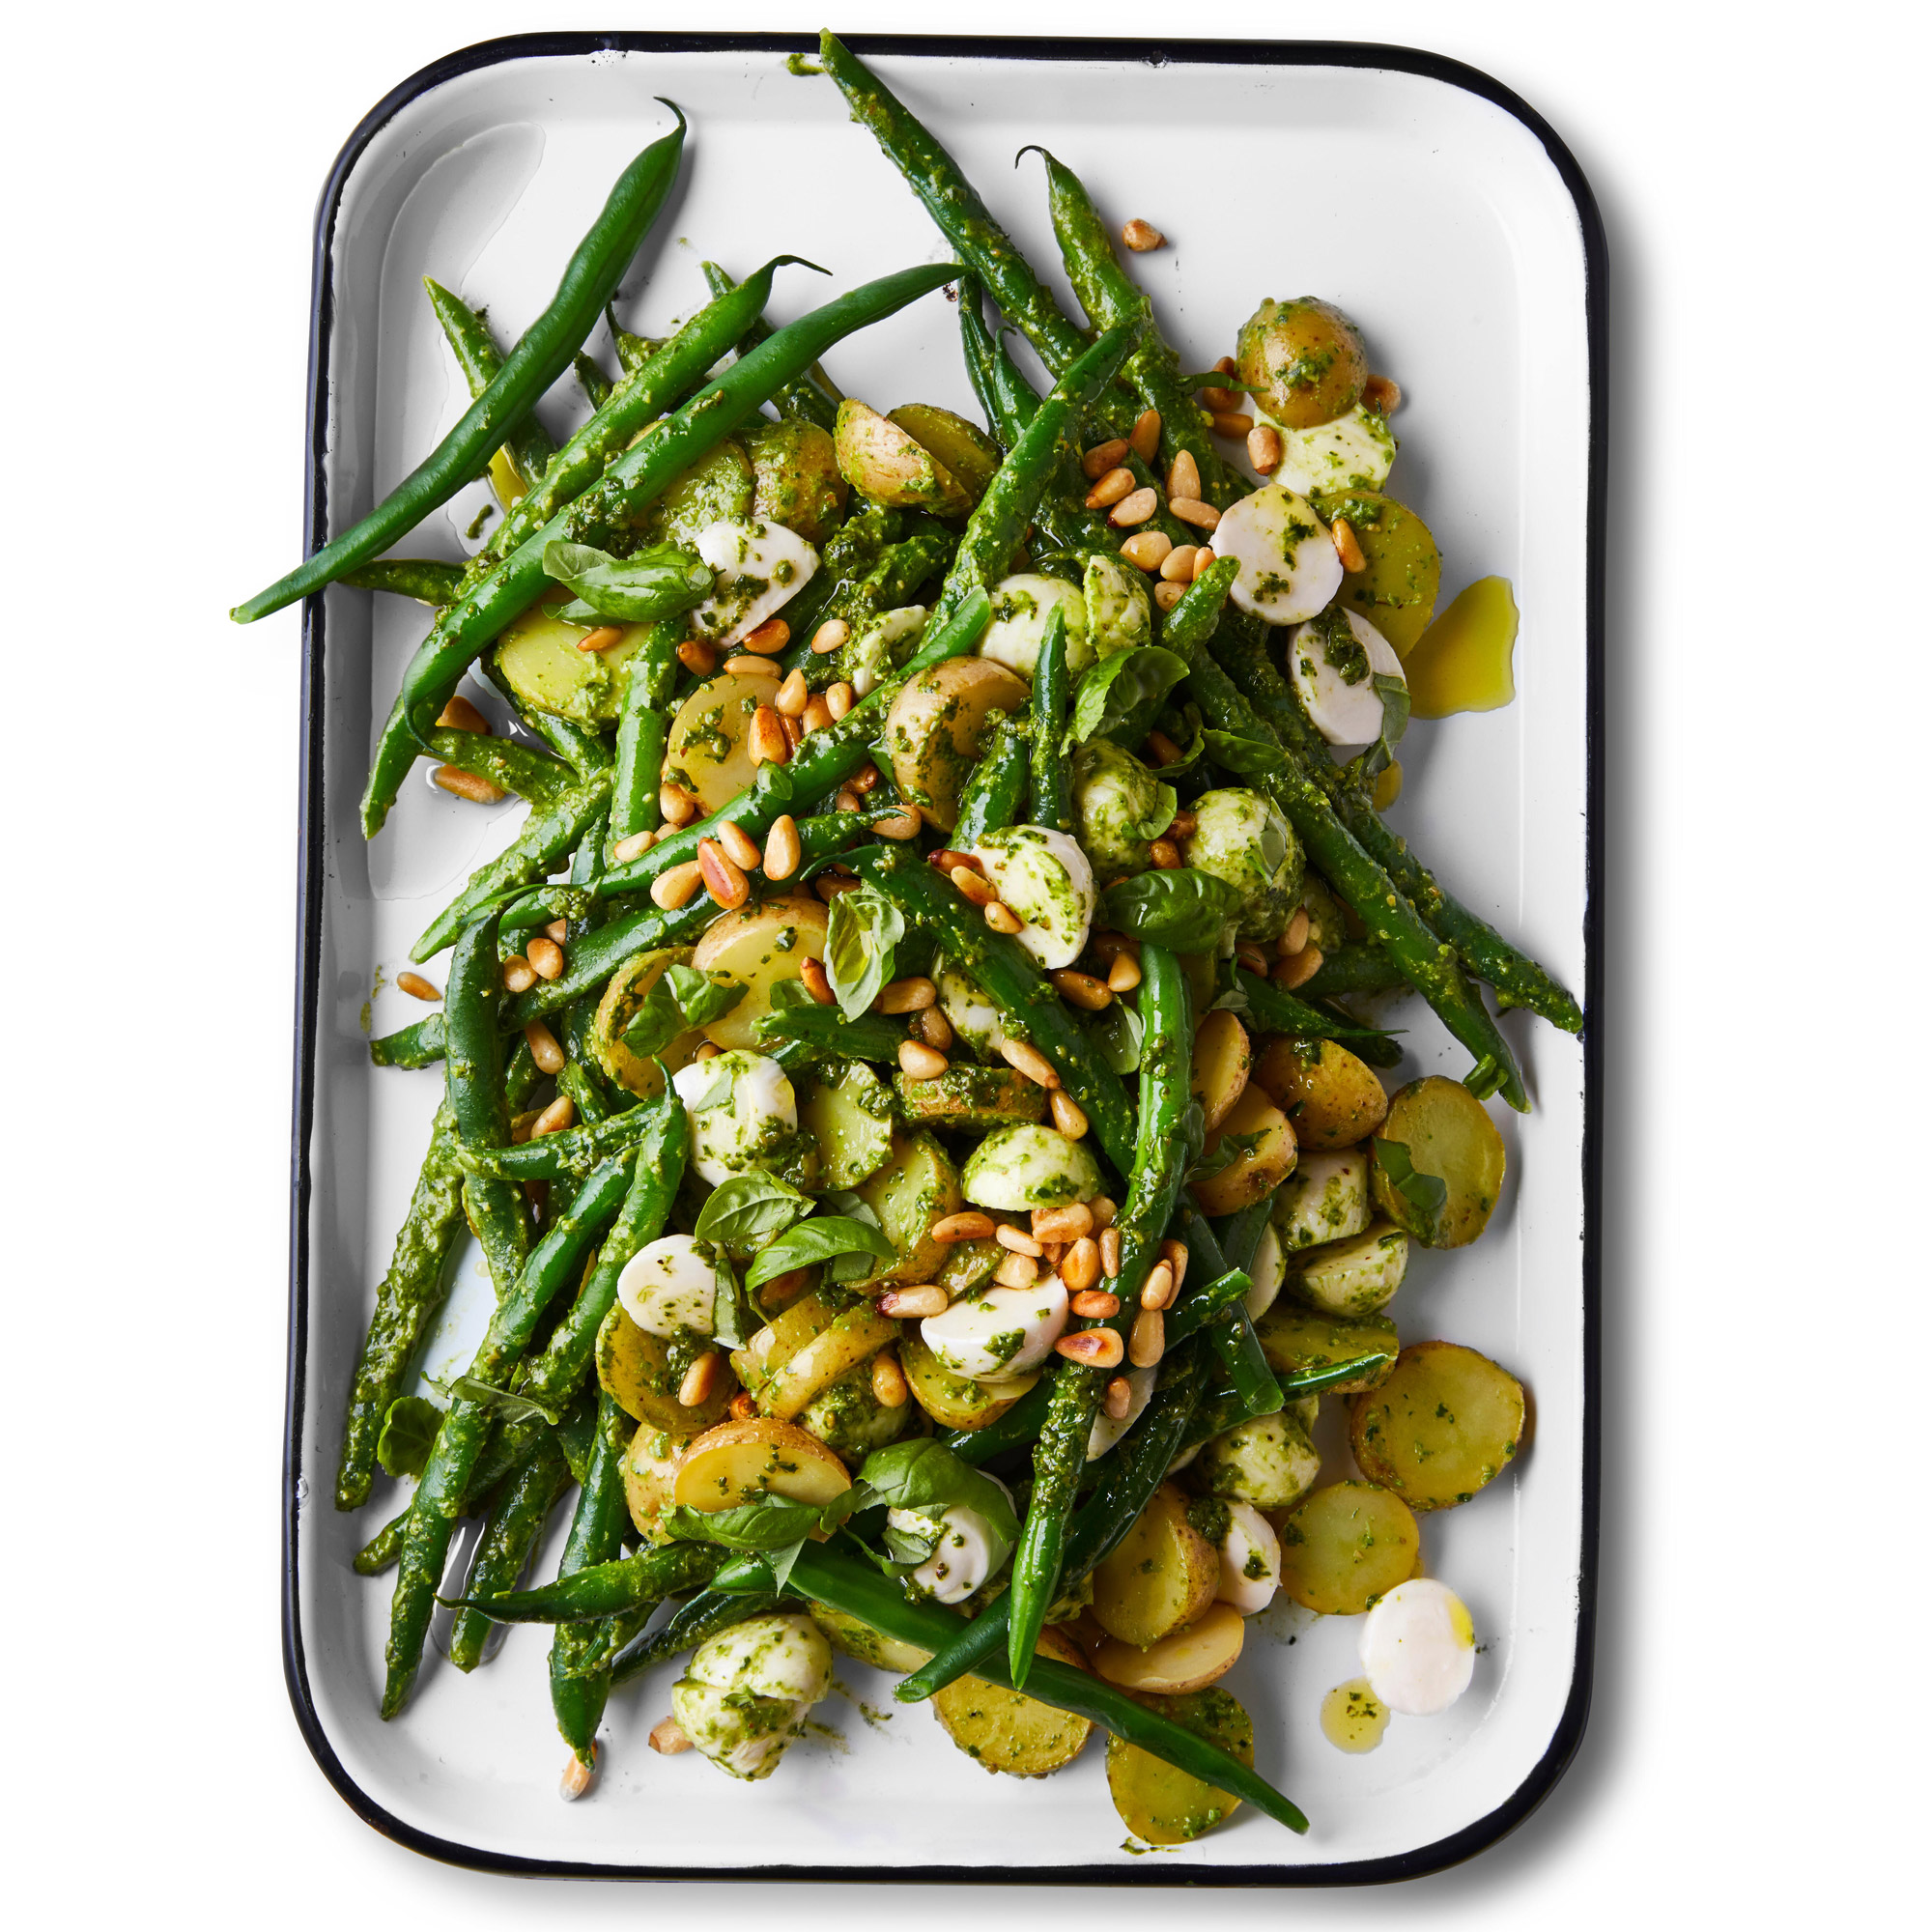 Seeing Green Potato Salad